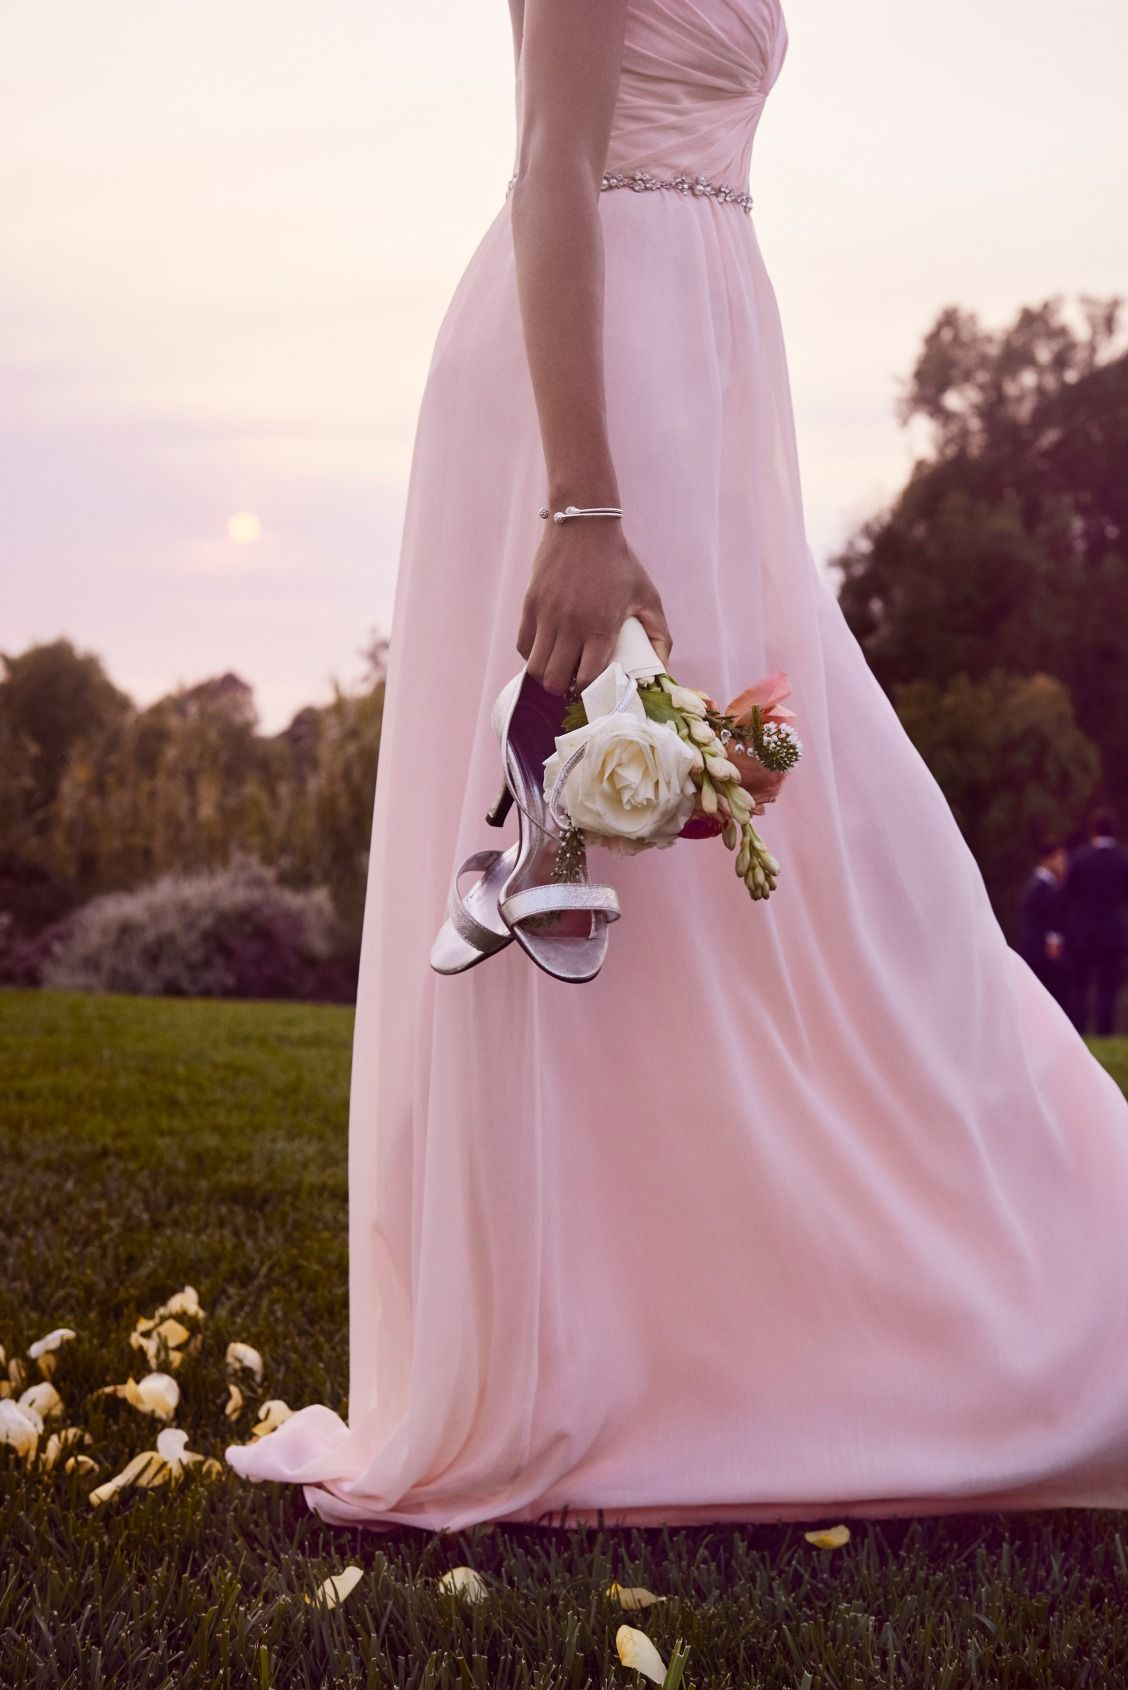 post-wedding moments | Shop petal pink bridesmaid dresses from ...